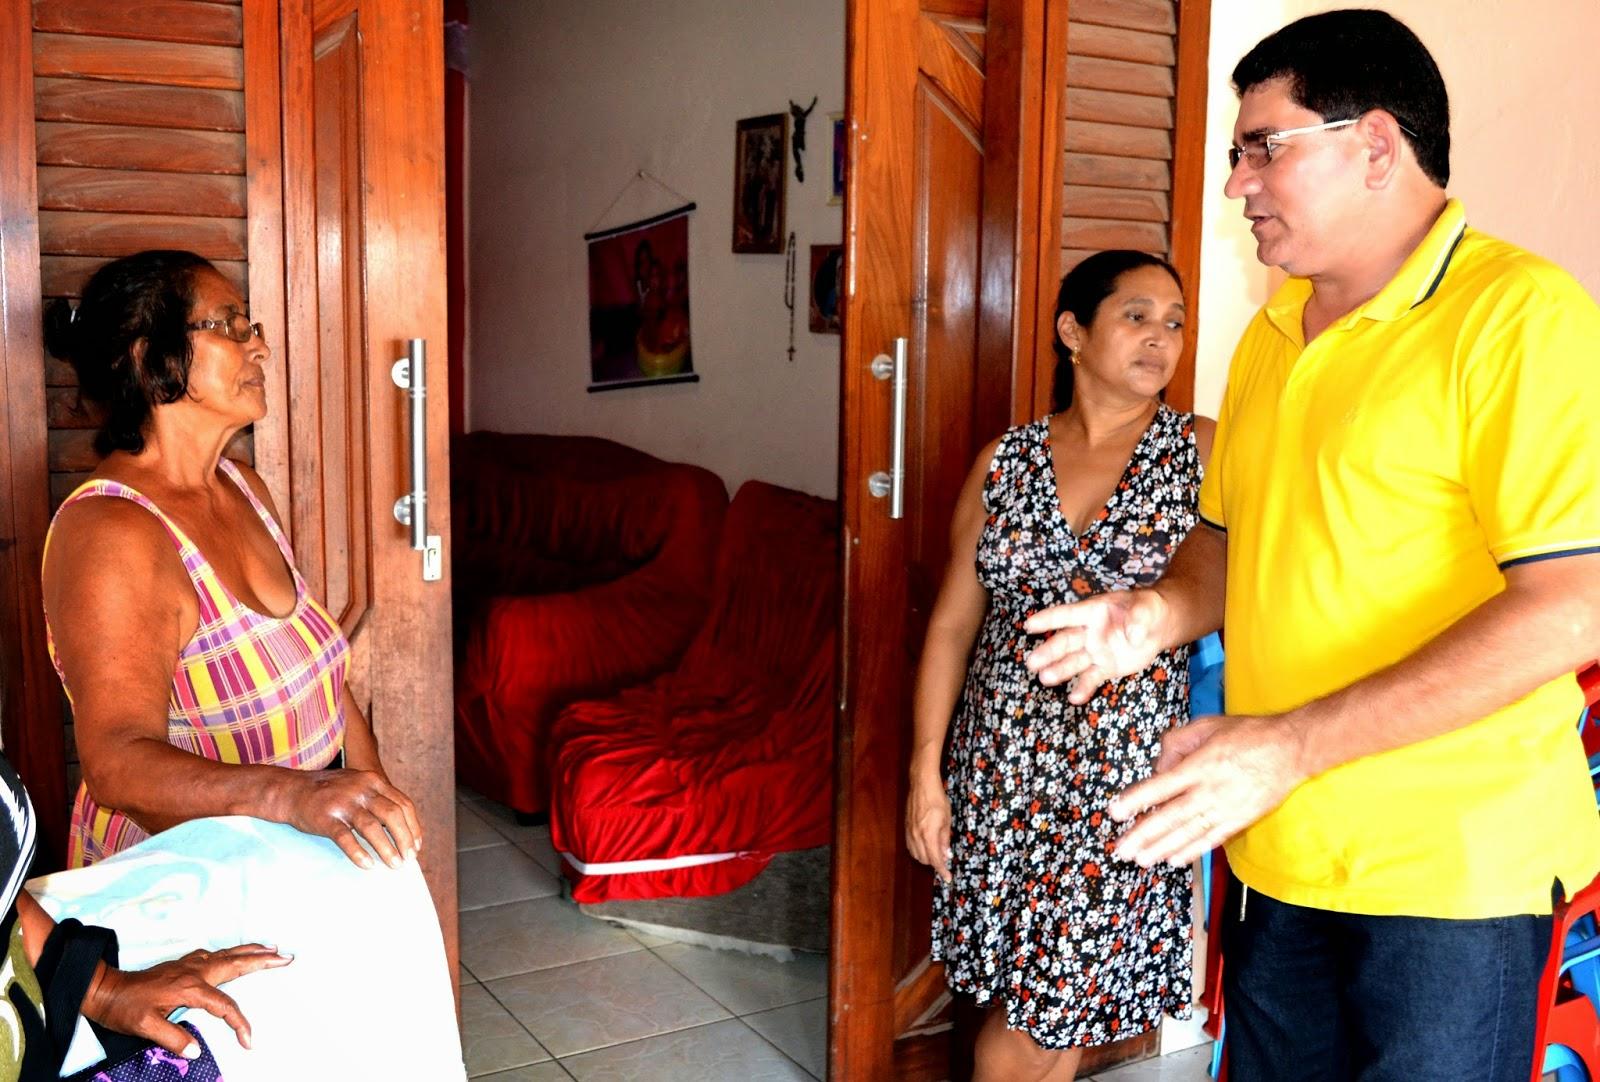 http://4.bp.blogspot.com/-xvsCFoq9__g/U1osN-9DuQI/AAAAAAAAJrs/dAUrTDQ05FA/s1600/Prefeito+em+conversa+com+moradores.JPG